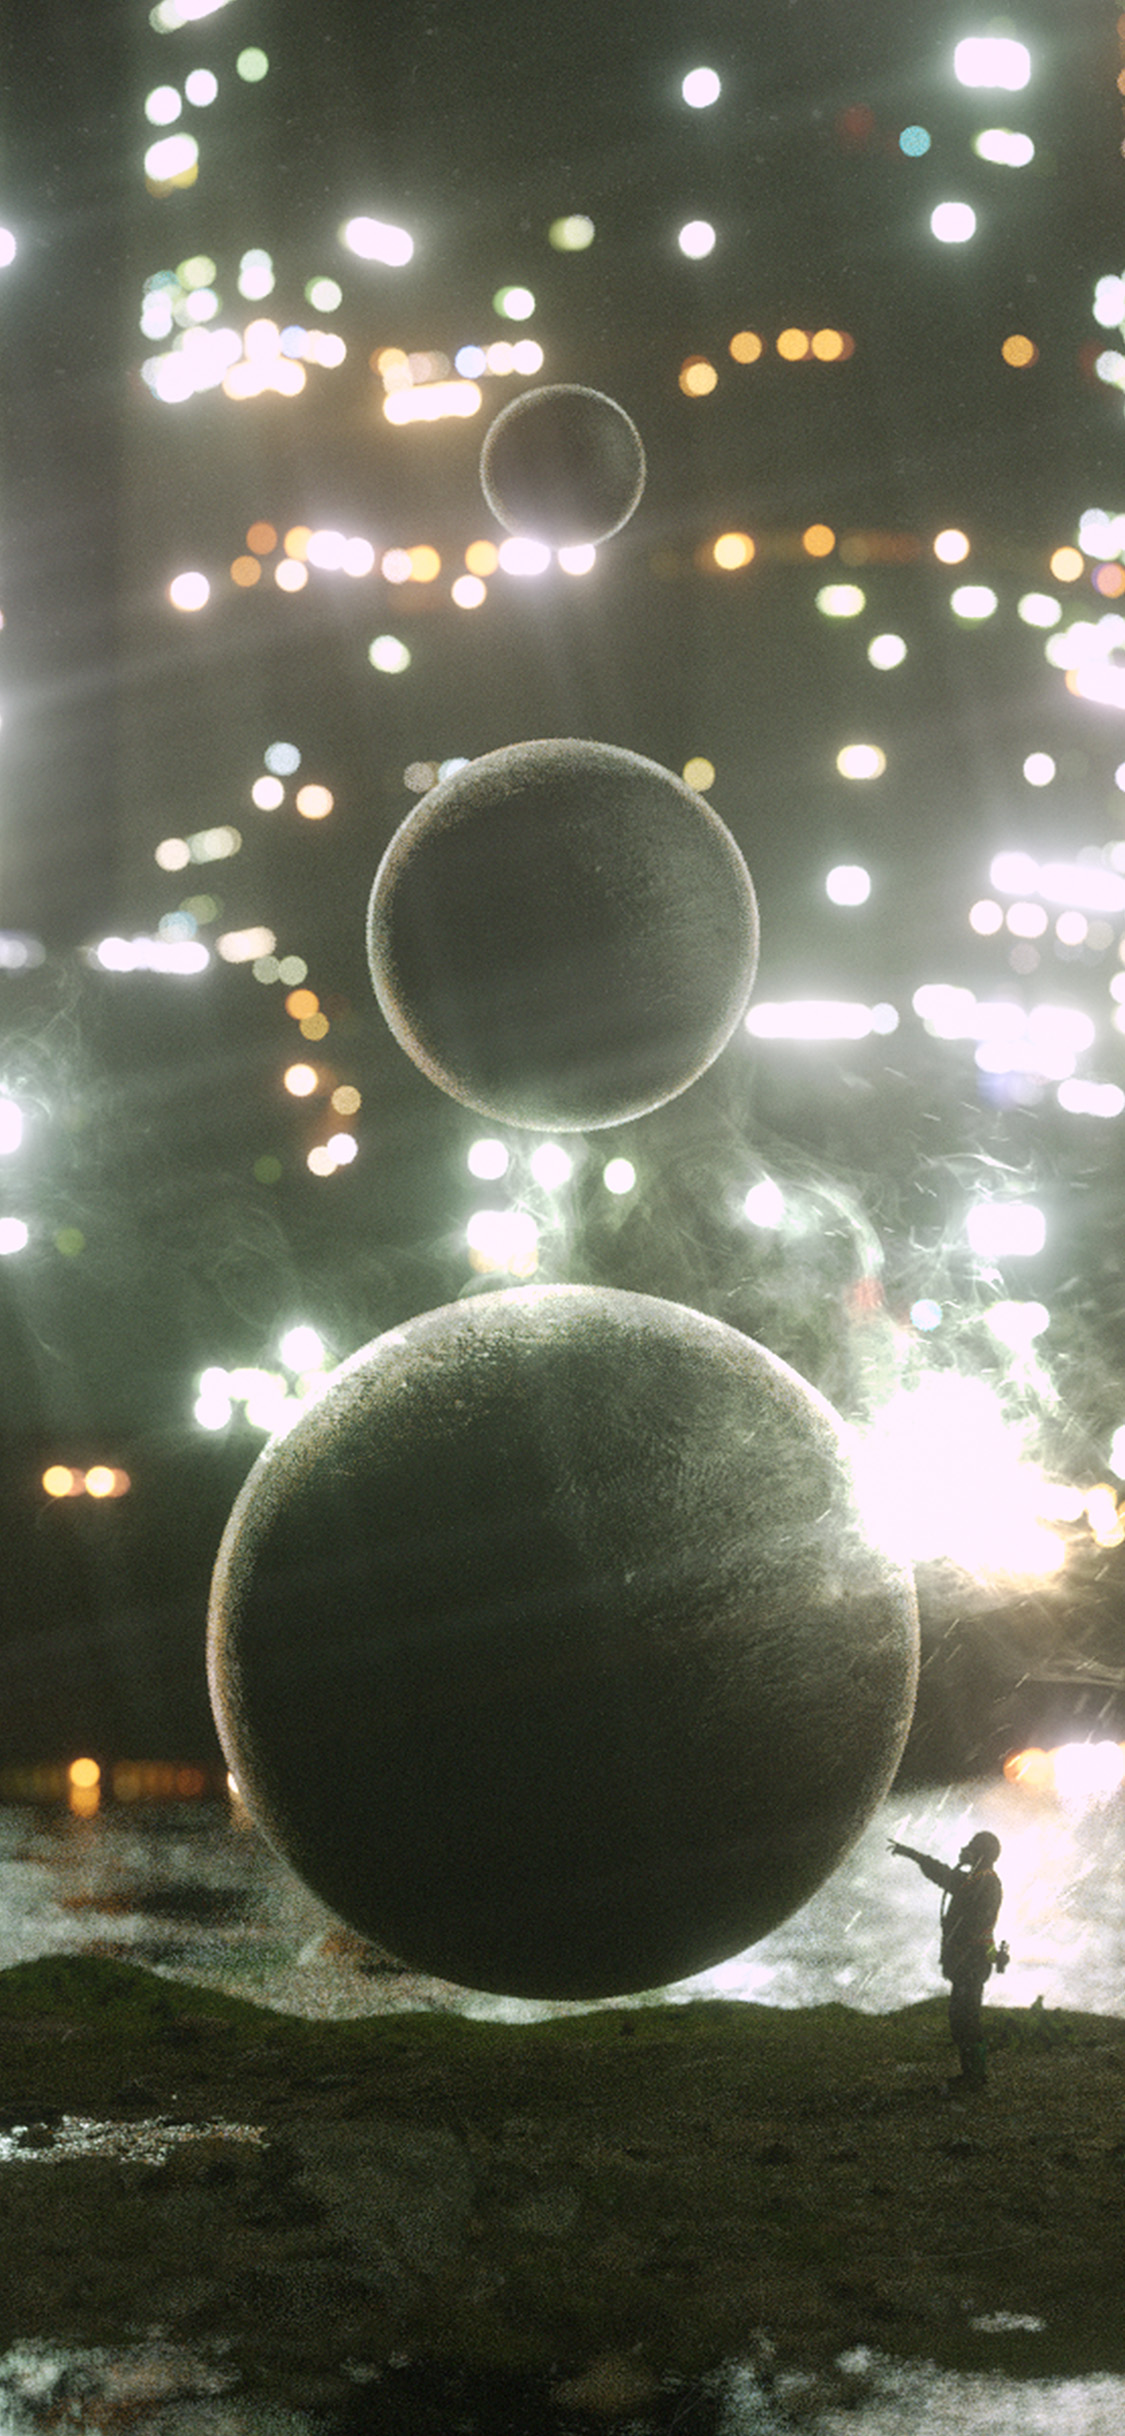 iPhonexpapers.com-Apple-iPhone-wallpaper-bg05-night-illust-abstract-light-flare-art